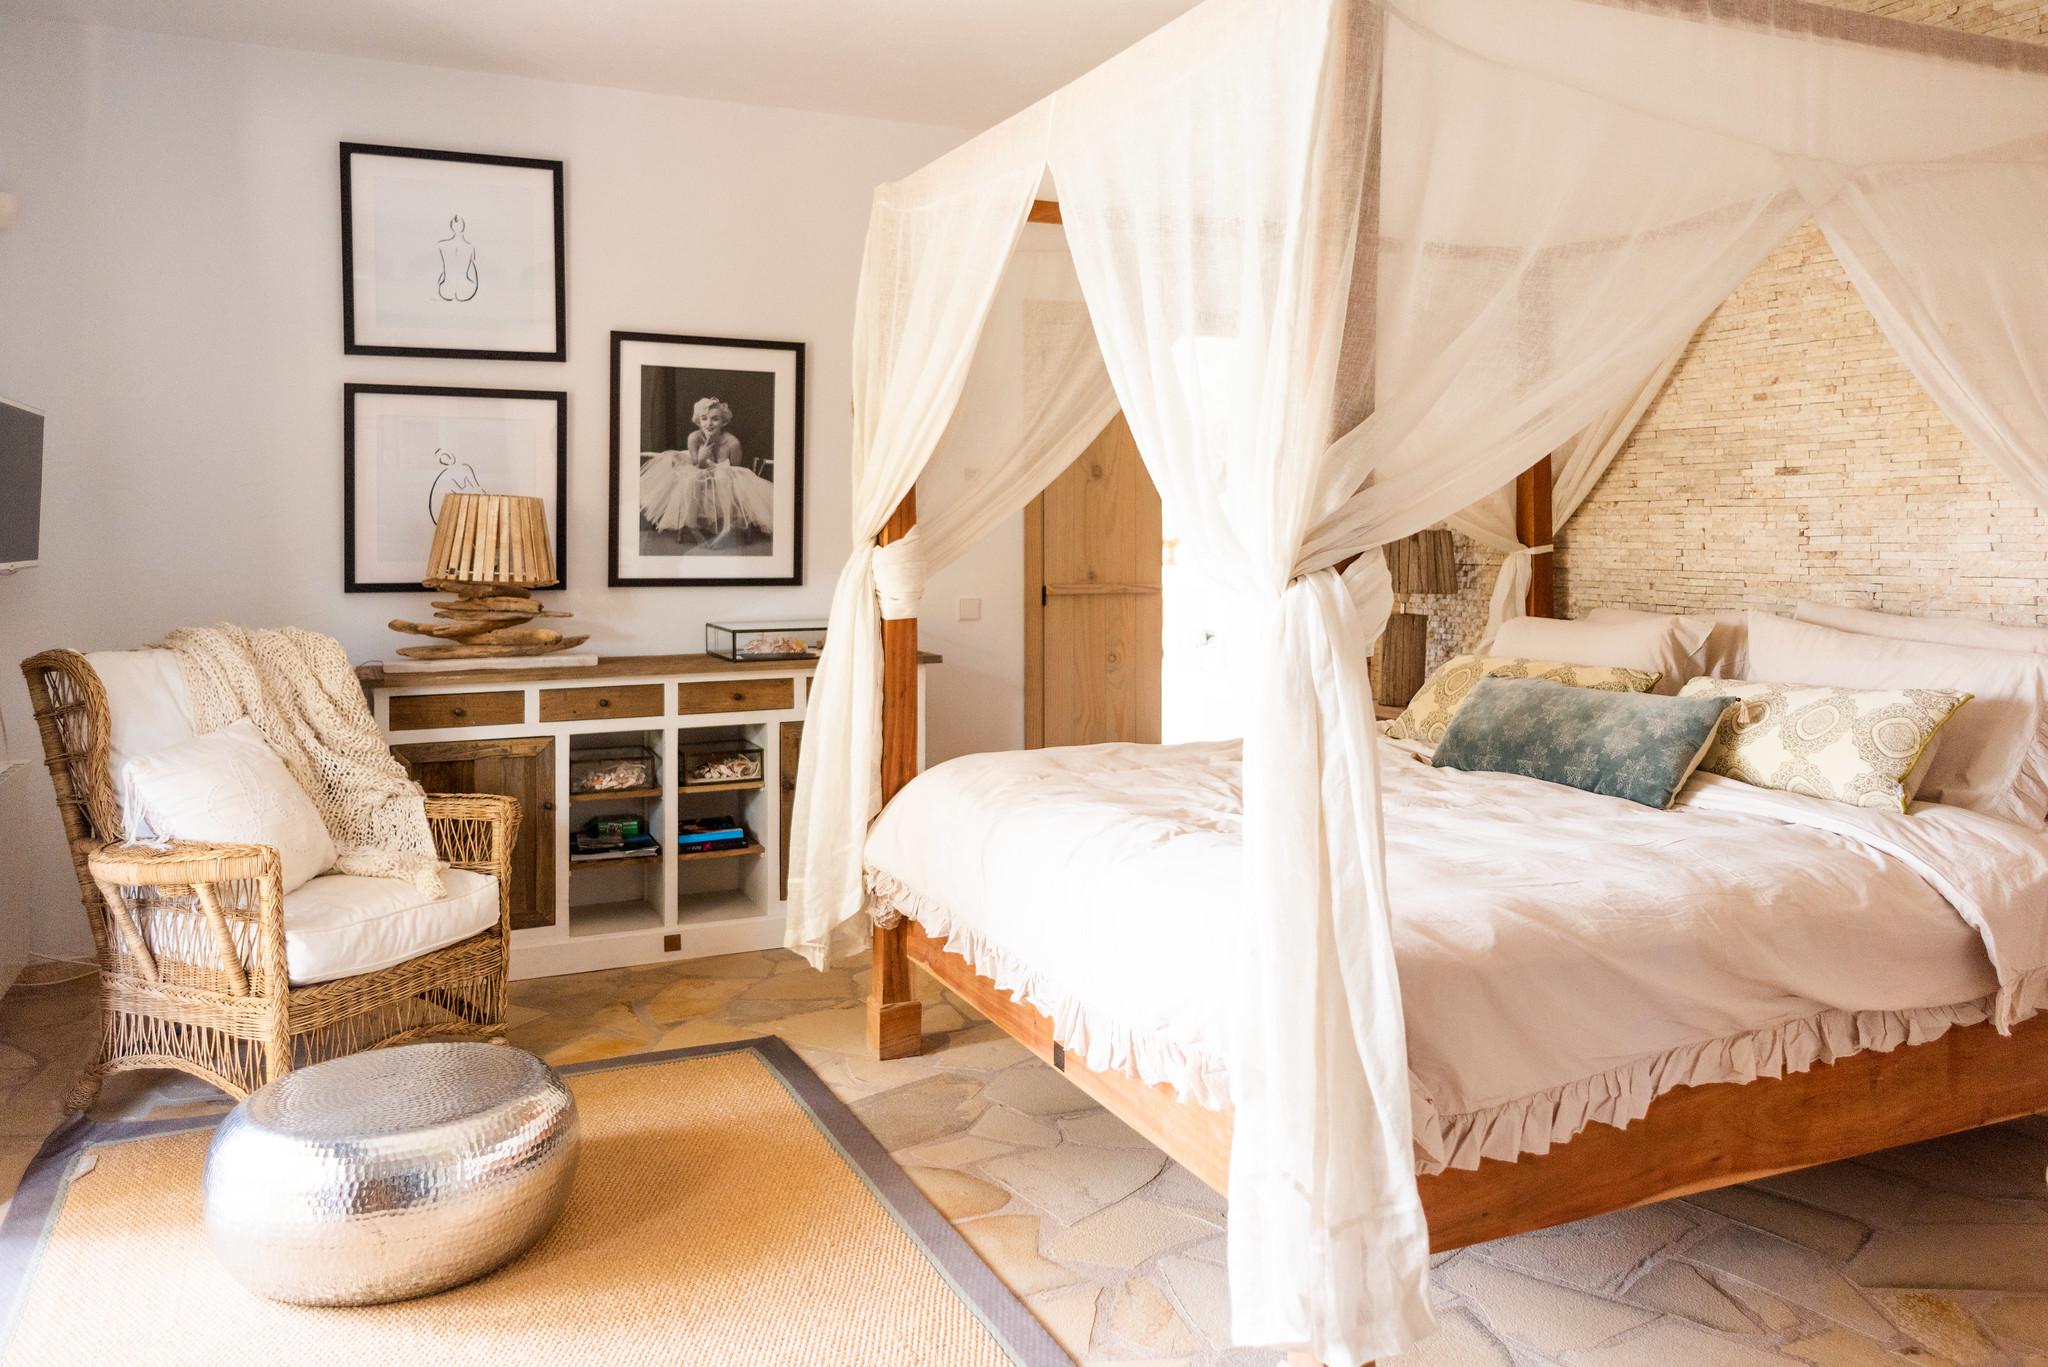 https://www.white-ibiza.com/wp-content/uploads/2020/05/white-ibiza-villas-can-riviere-interior-master.jpg